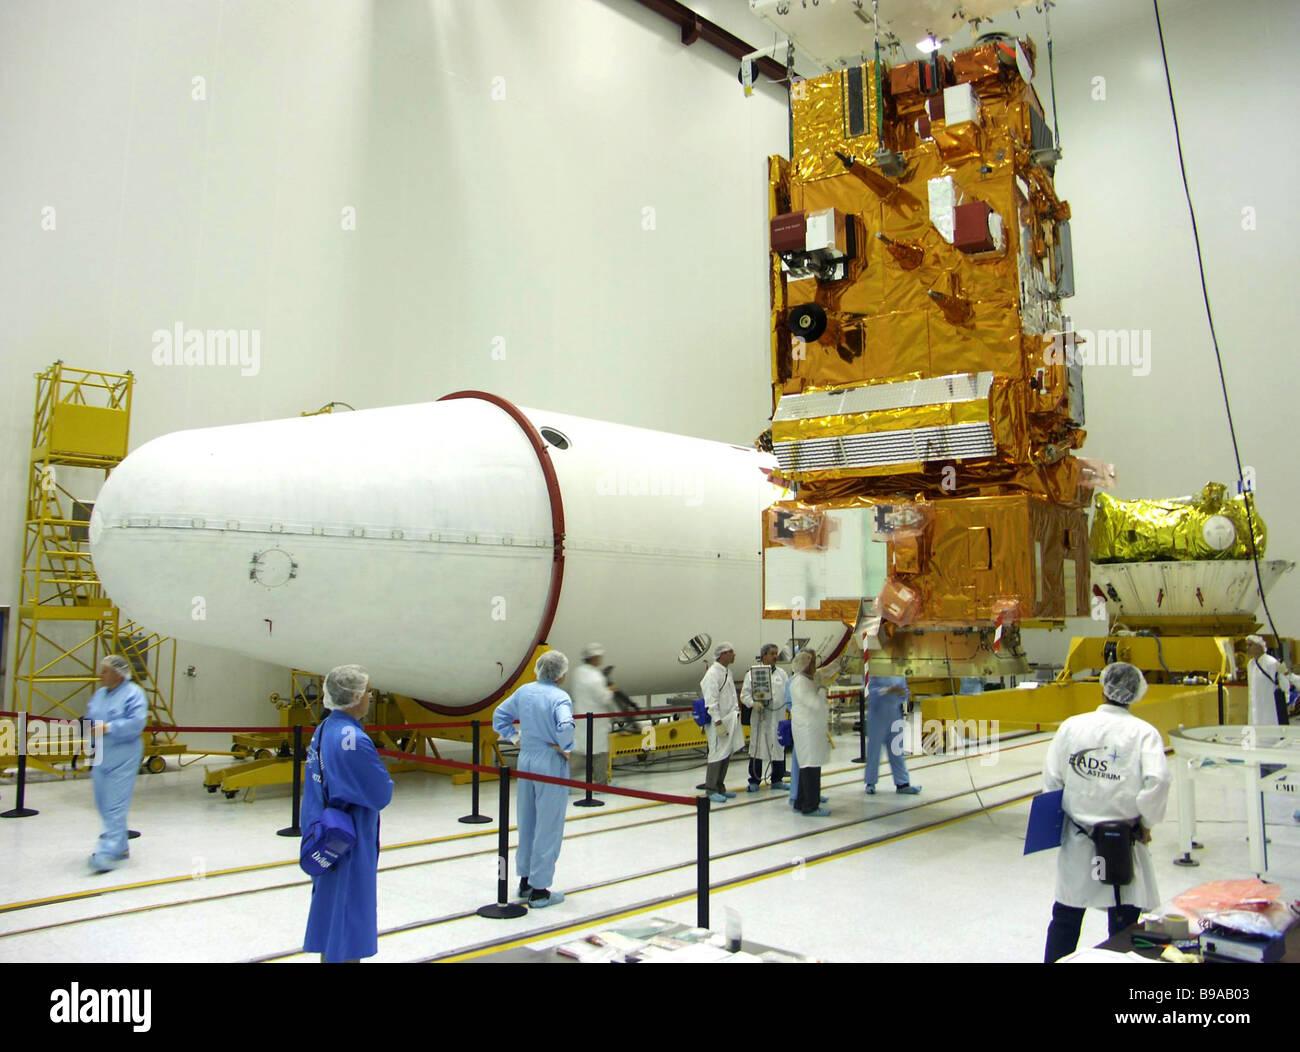 Final preparations to launch the European MetOp meteorological satellite at Baikonur cosmodrome - Stock Image